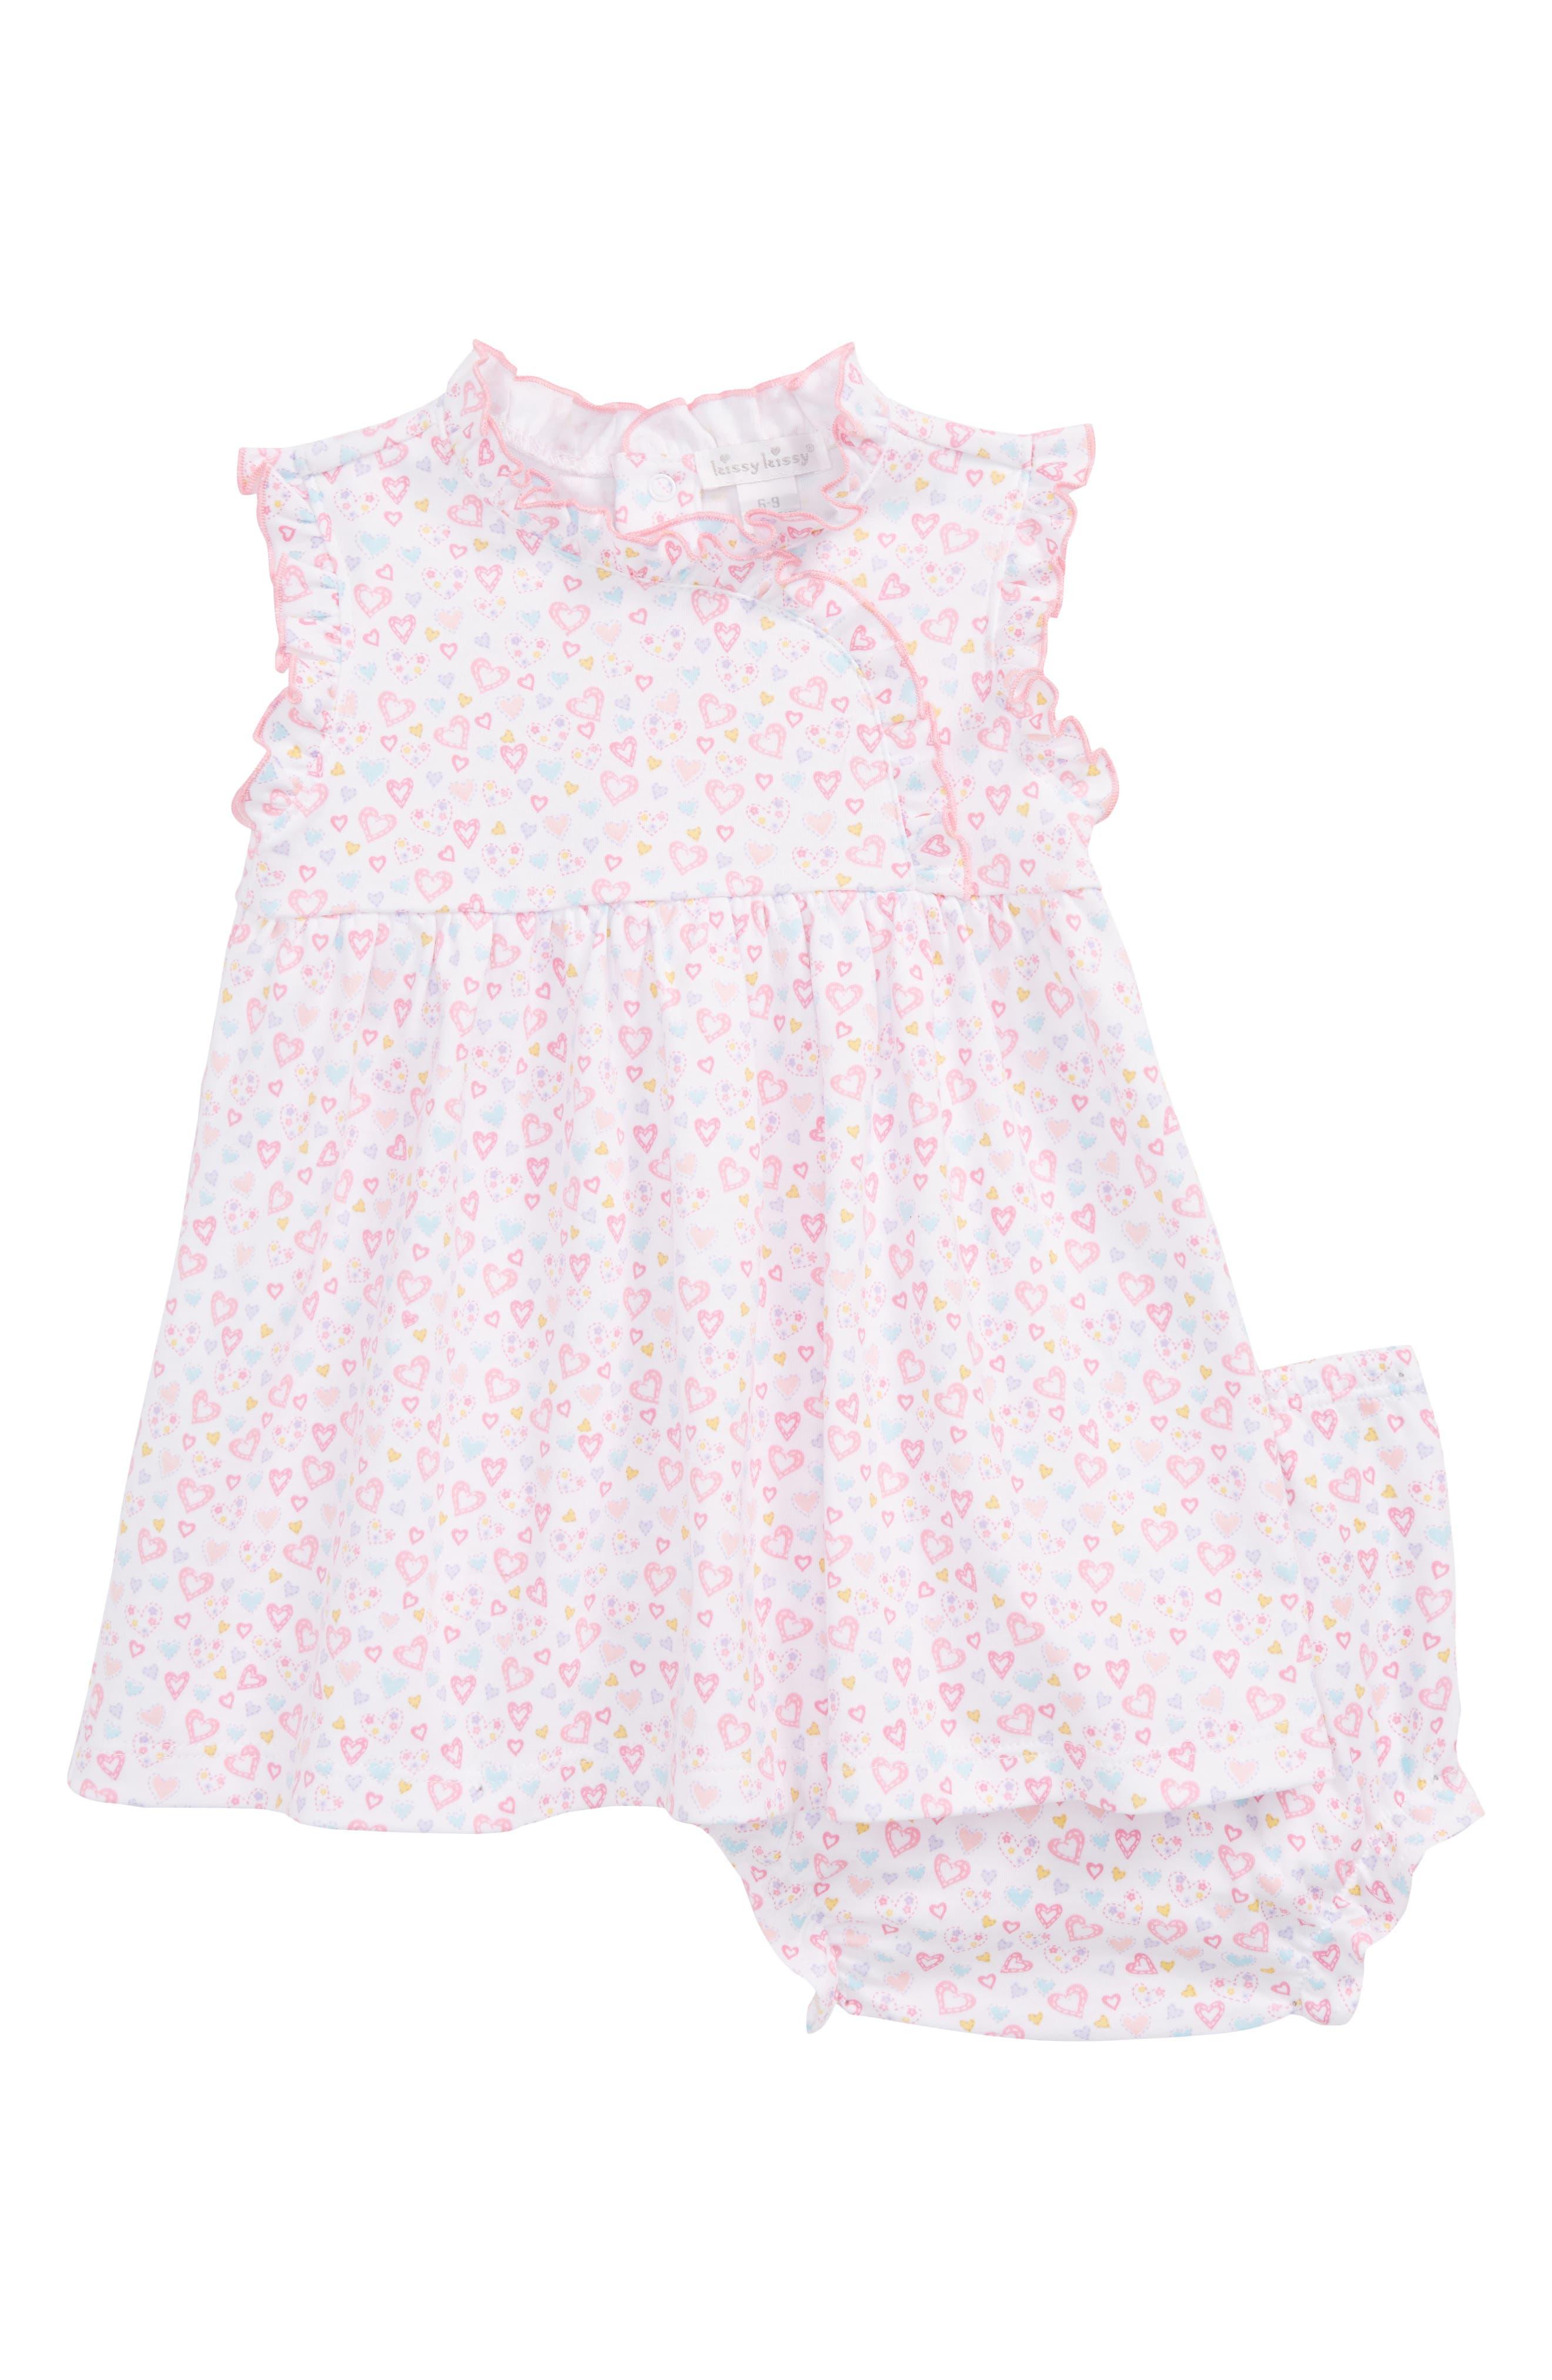 Main Image - Kissy Kissy Dina Darlings Dress (Baby Girls)